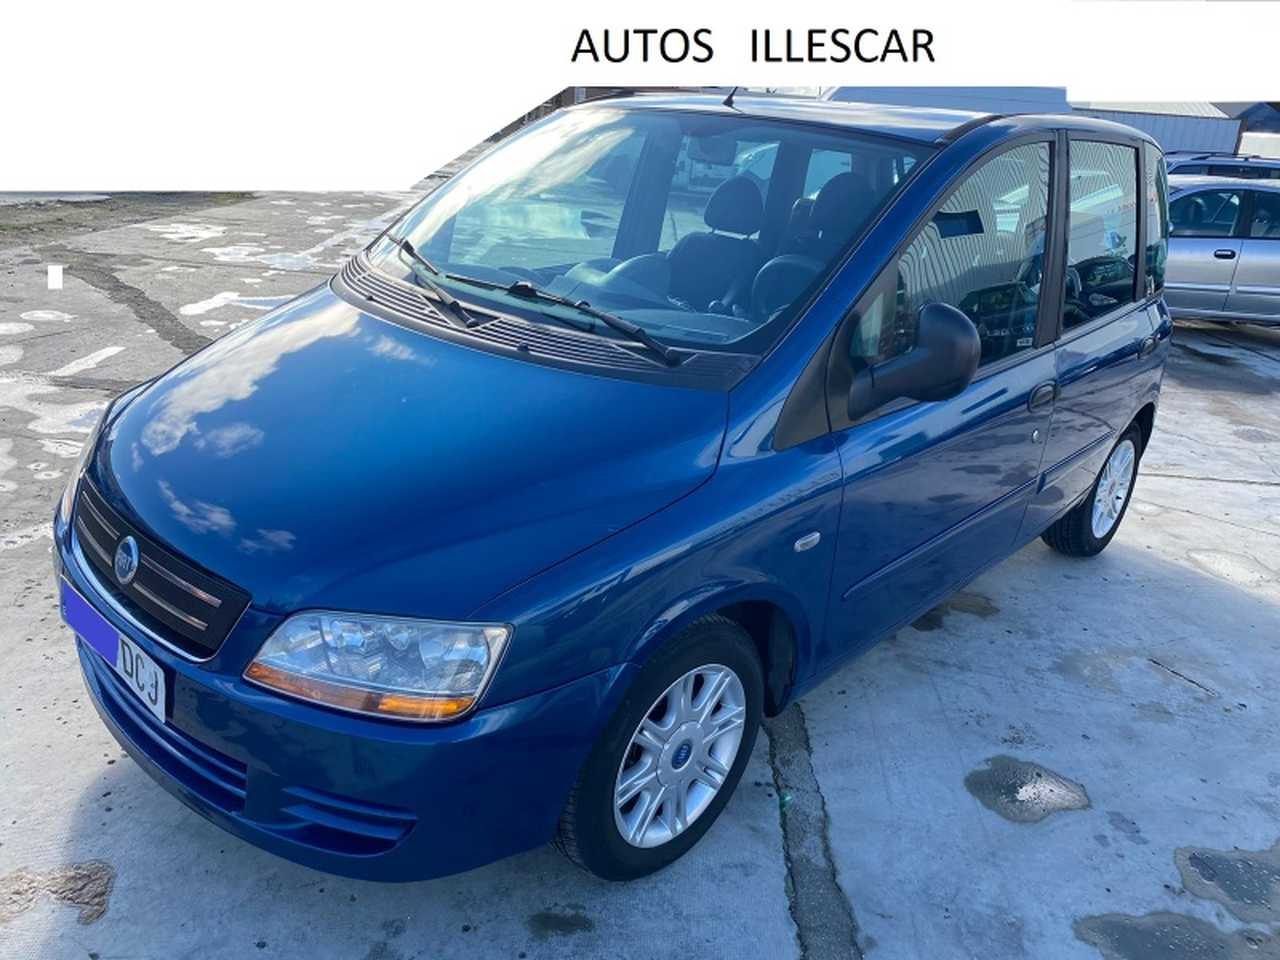 Fiat Multipla 1.9 JTD 115 CV ADMITIMOS PRUEBA MECANICA  - Foto 1